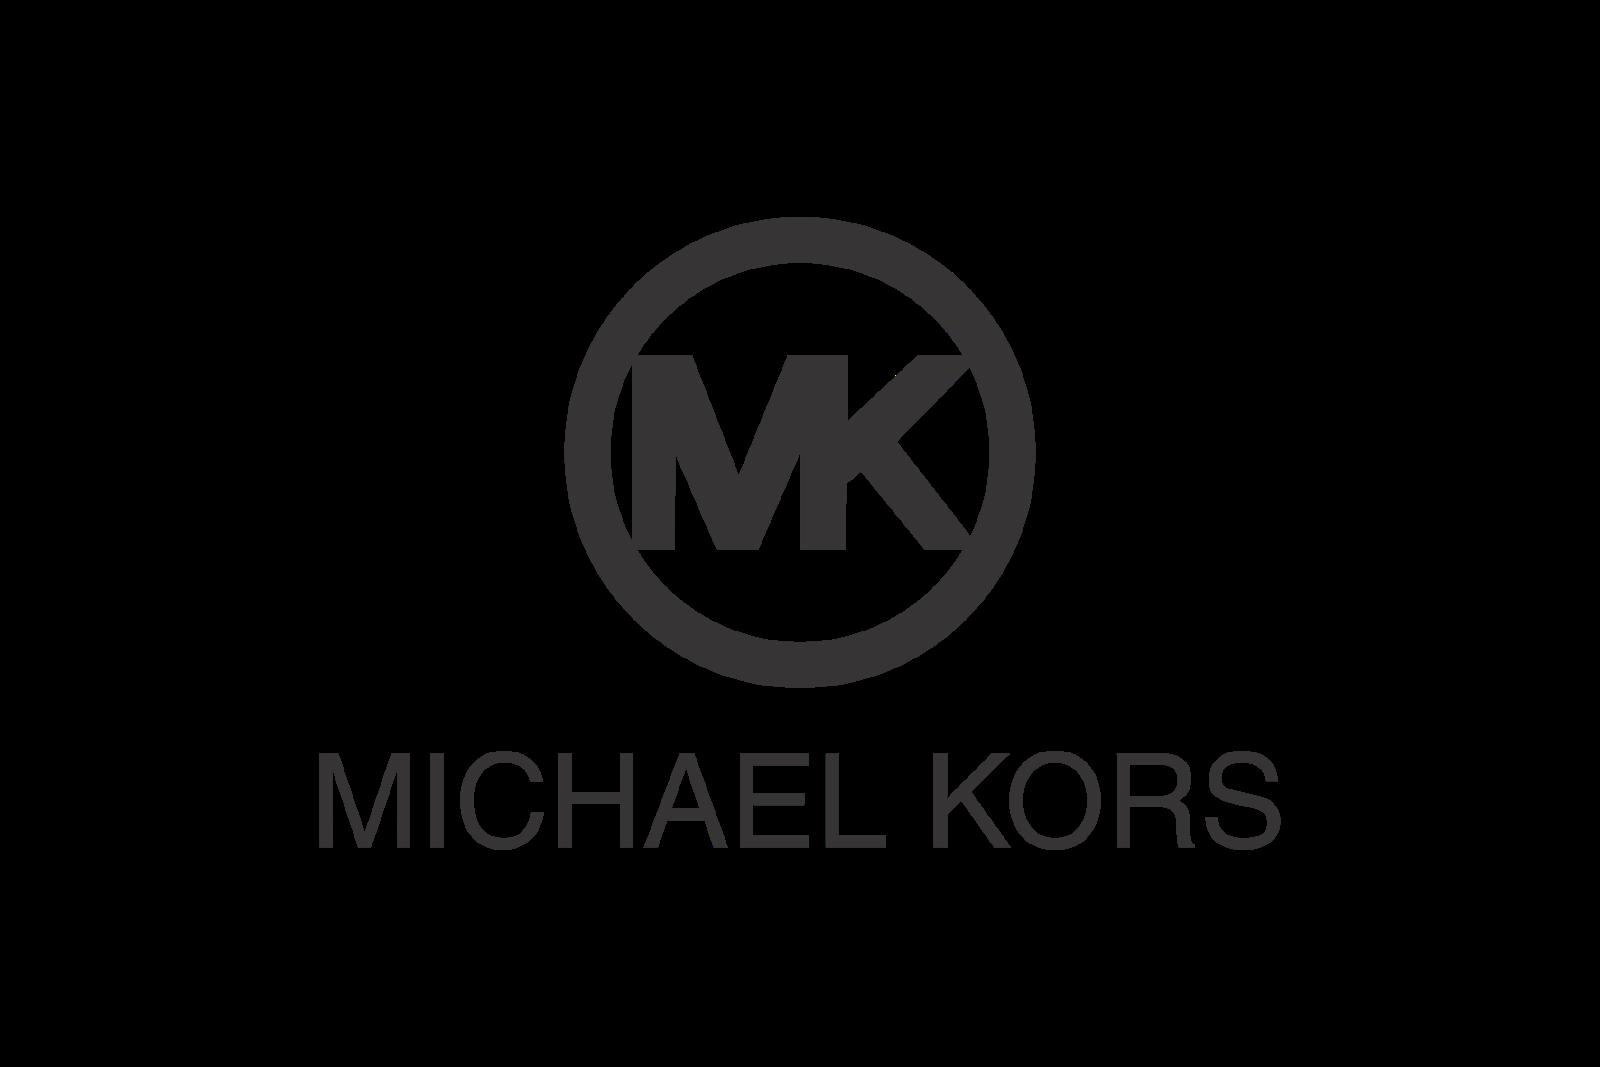 Michael Kors announces closures but doesn't name names